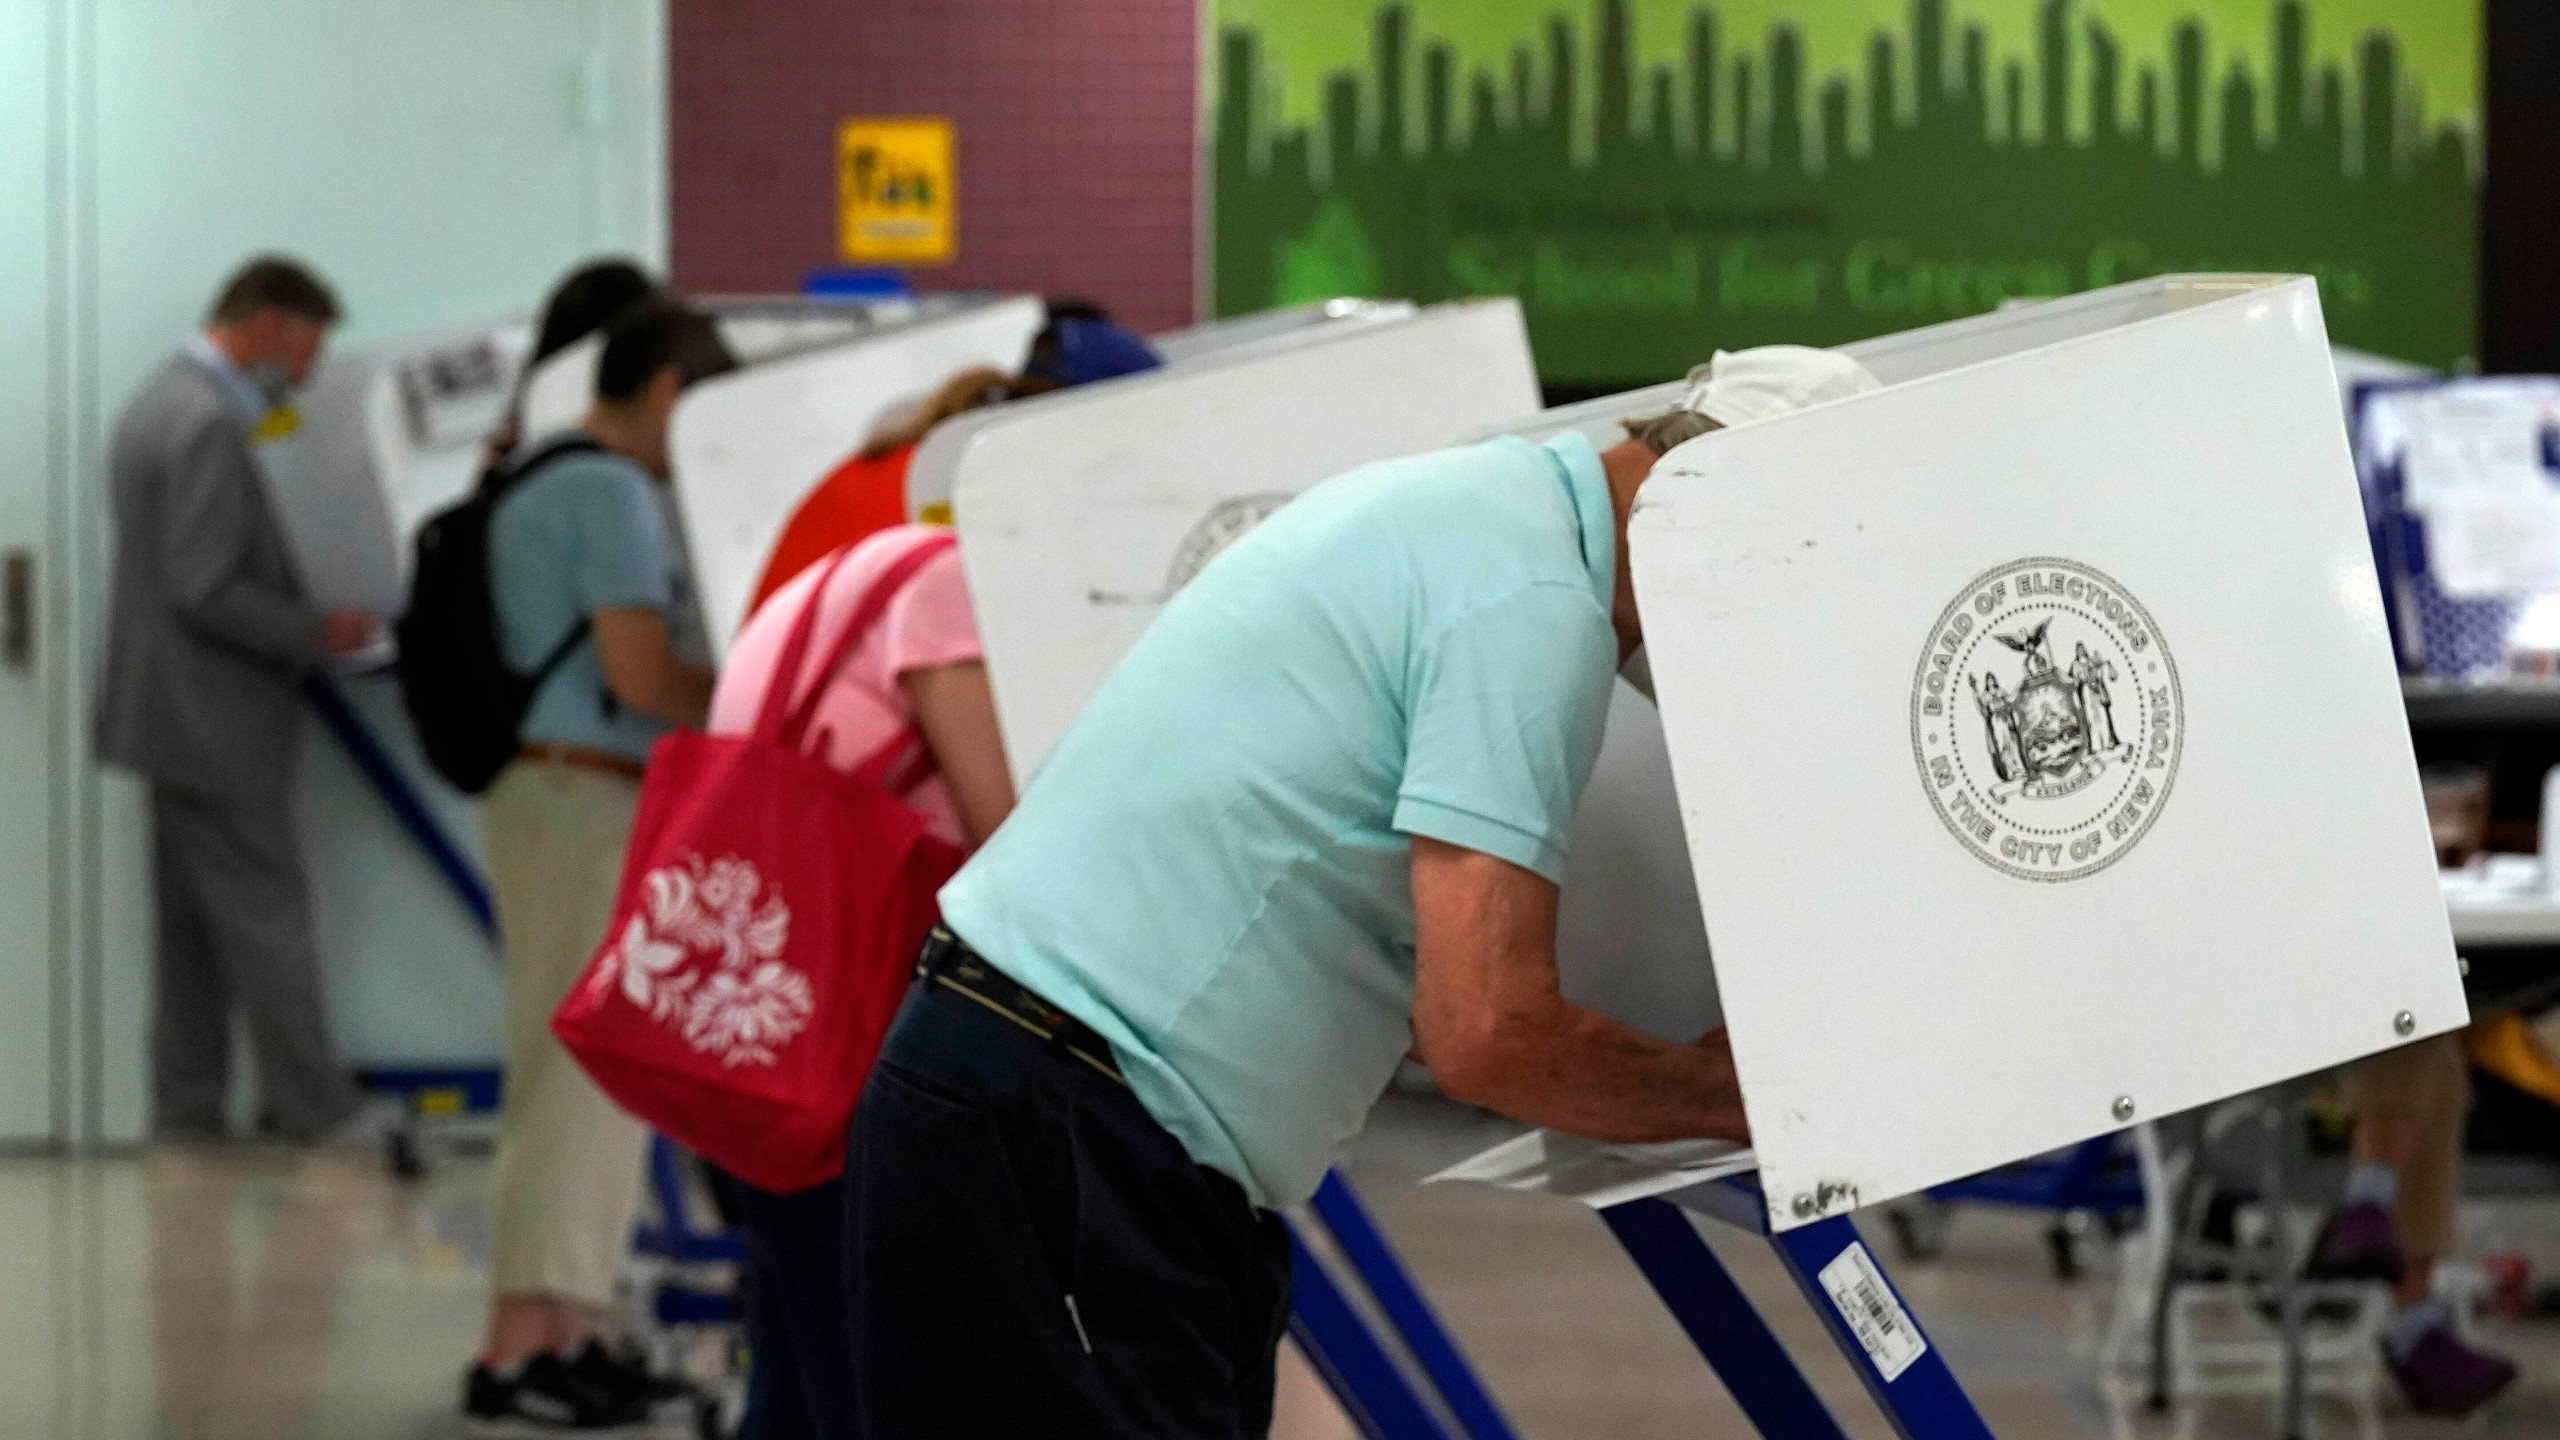 Voters mark their ballots at Frank McCourt High School, in New York, on June 22, 2021. (Richard Drew/Associated Press)